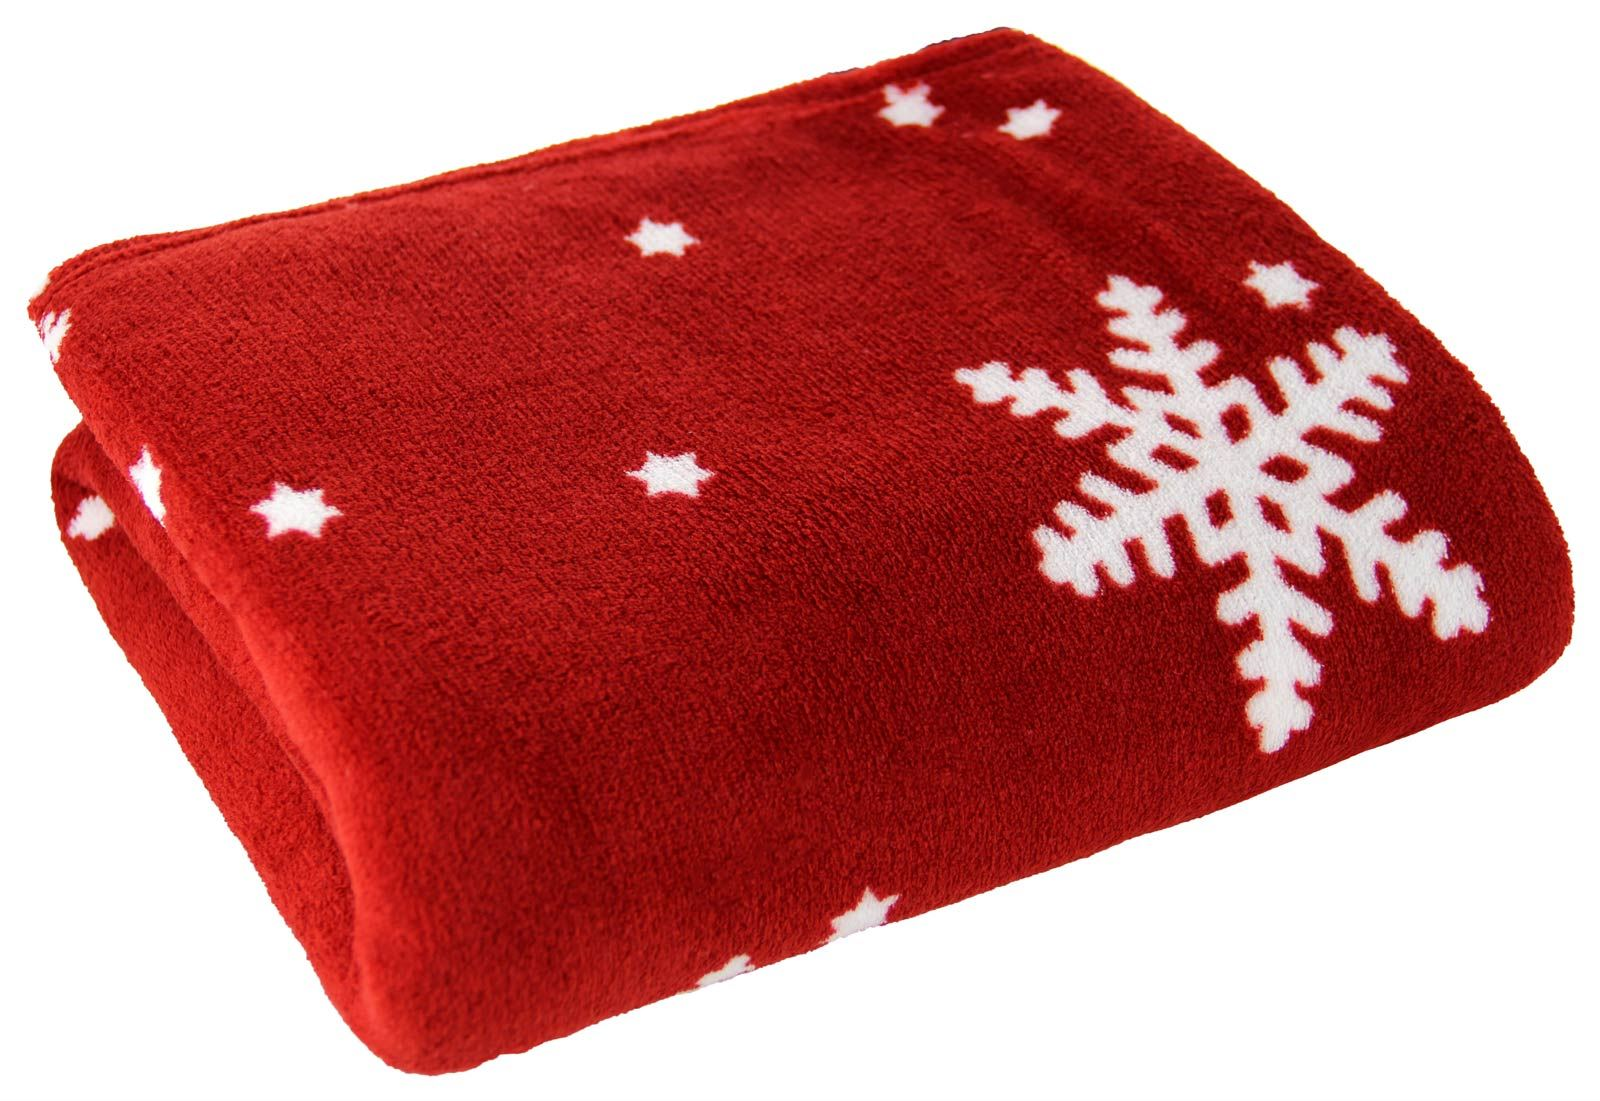 christmas throw blanket festive fleece plush and cosy snowflake nordic reindeer ebay. Black Bedroom Furniture Sets. Home Design Ideas